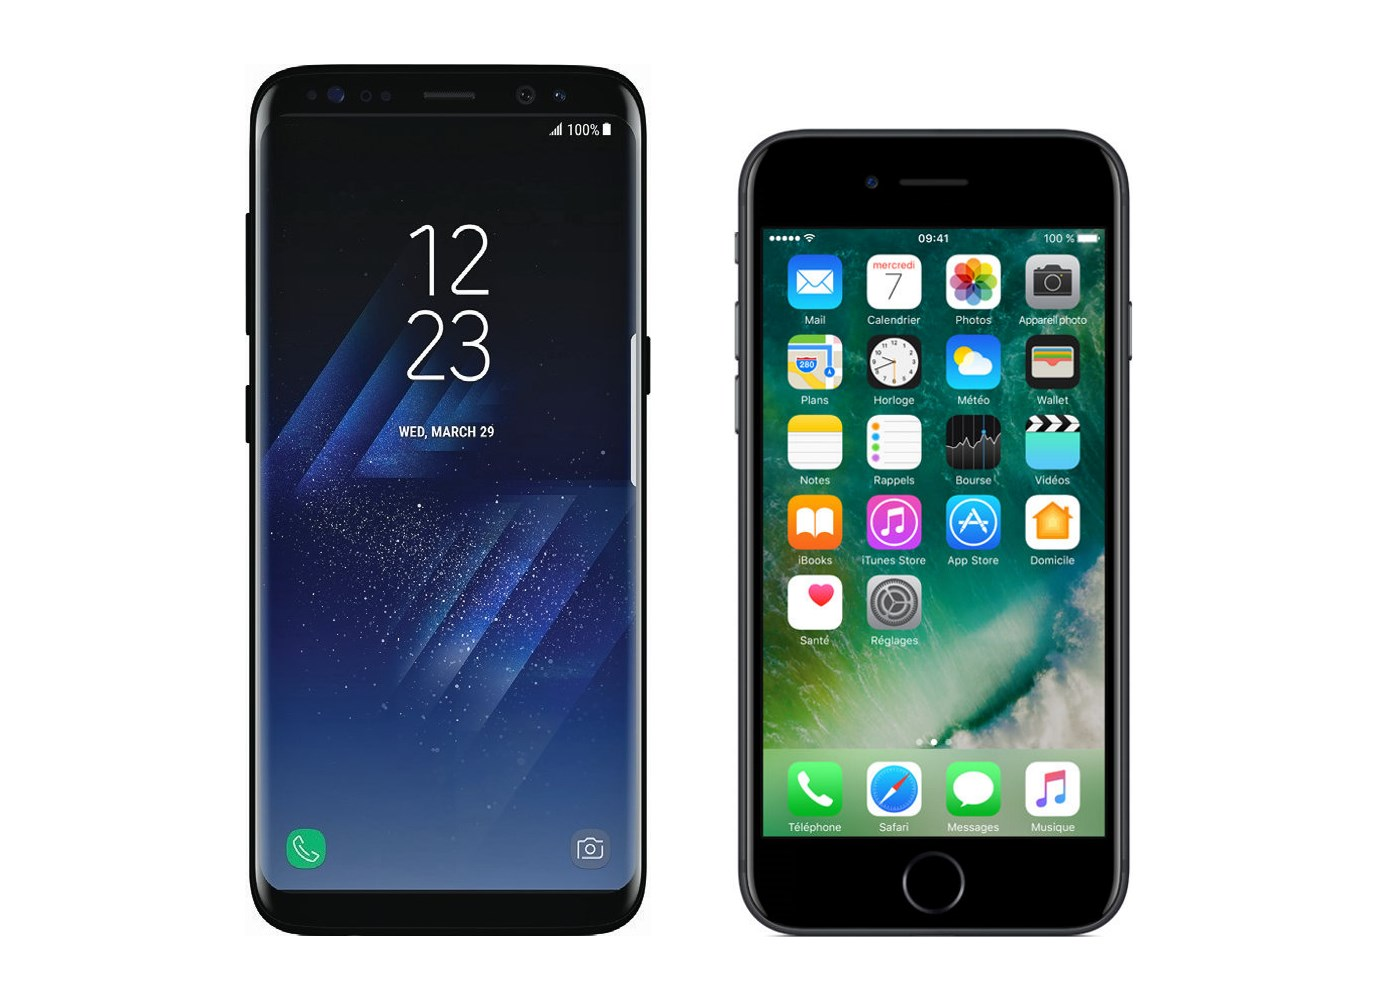 SAMSUNG S8 VS APPLE IPHONE 7